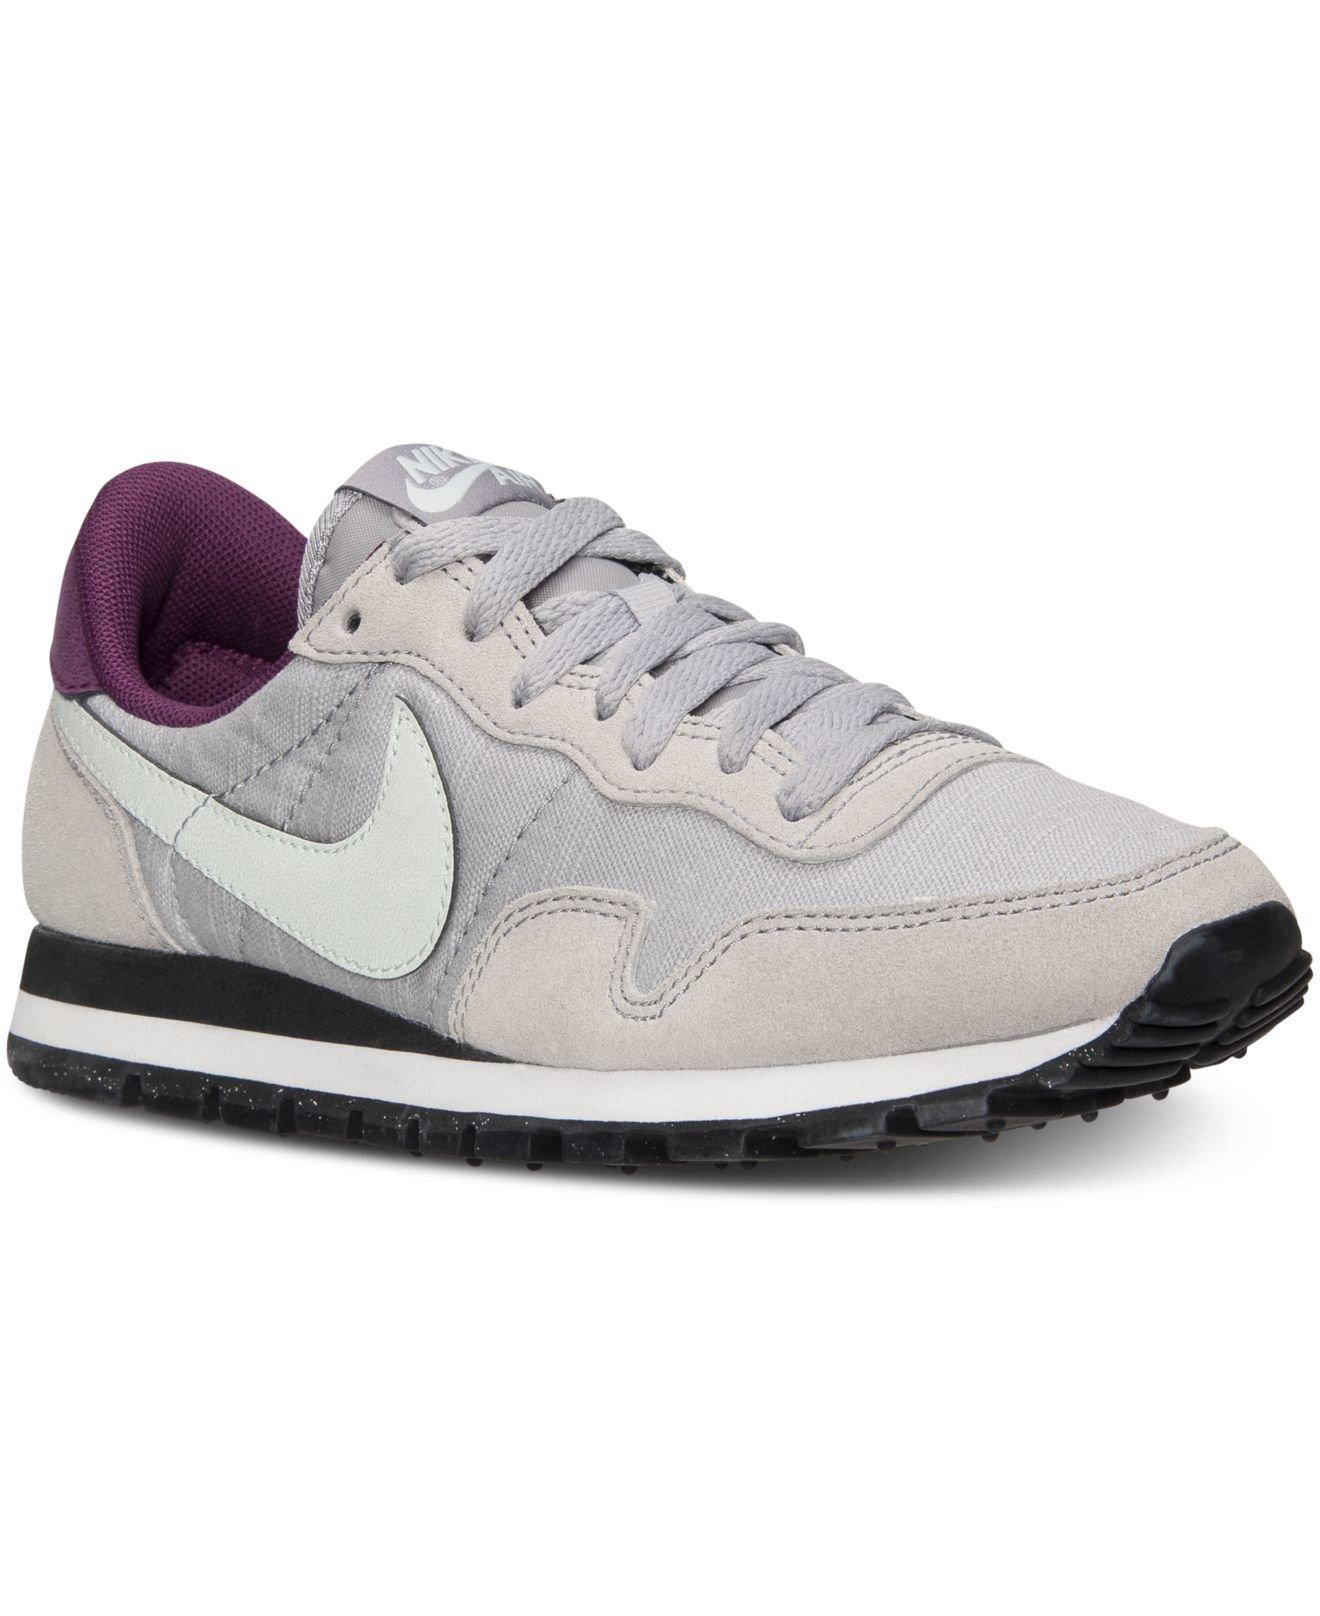 Womens W Air Pegasus 83 Low-Top Sneakers Nike UDtaa